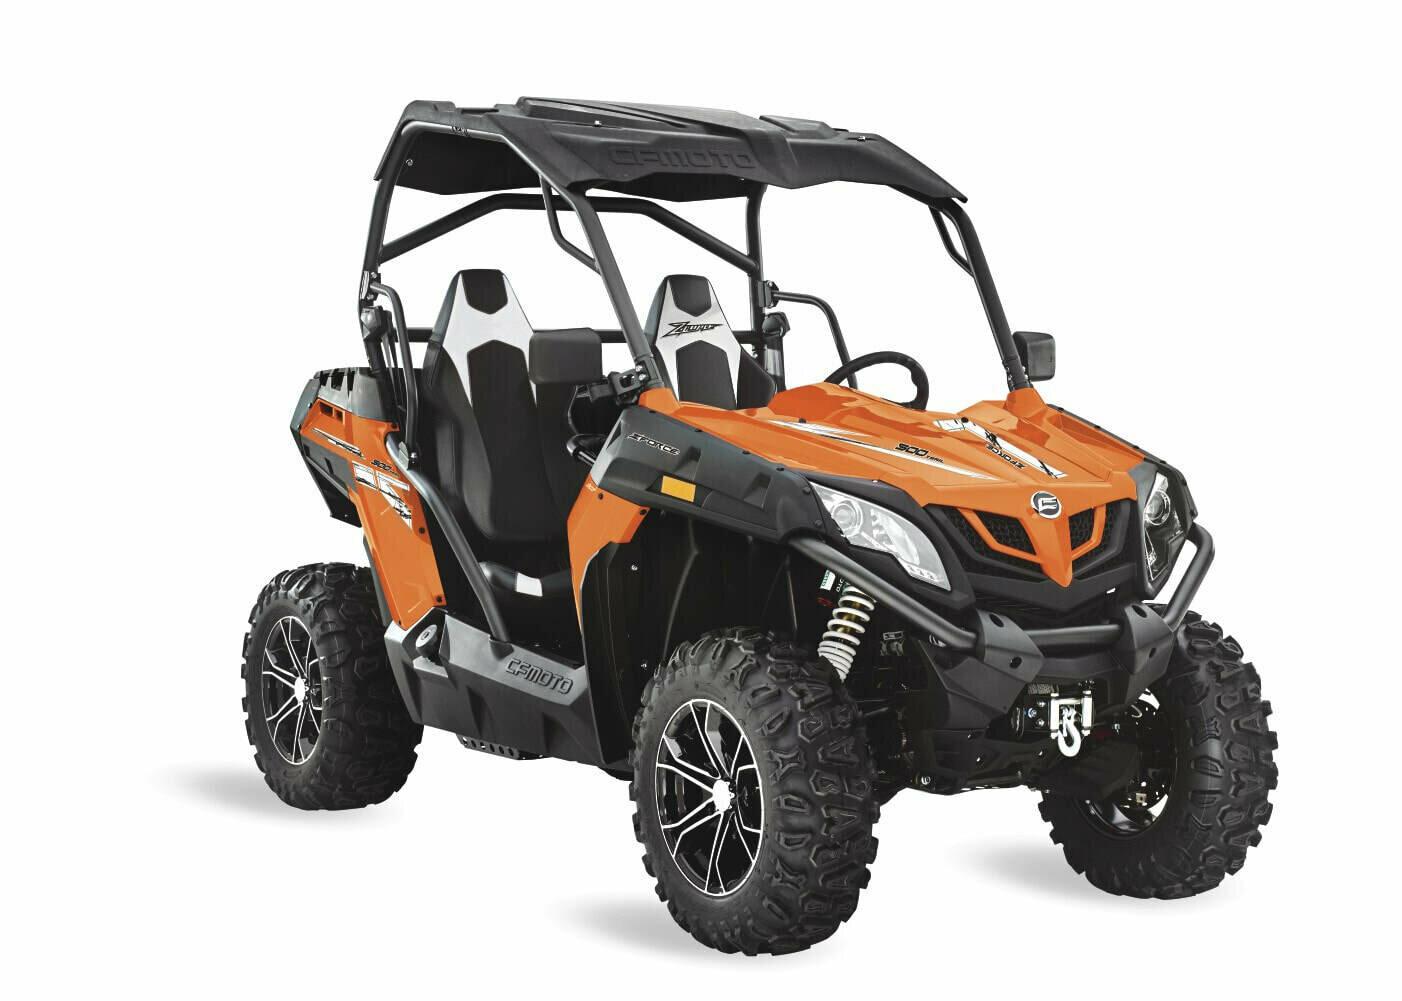 2019 CFMOTO ZFORCE 500 Trail EPS SSV 4x4 Orange